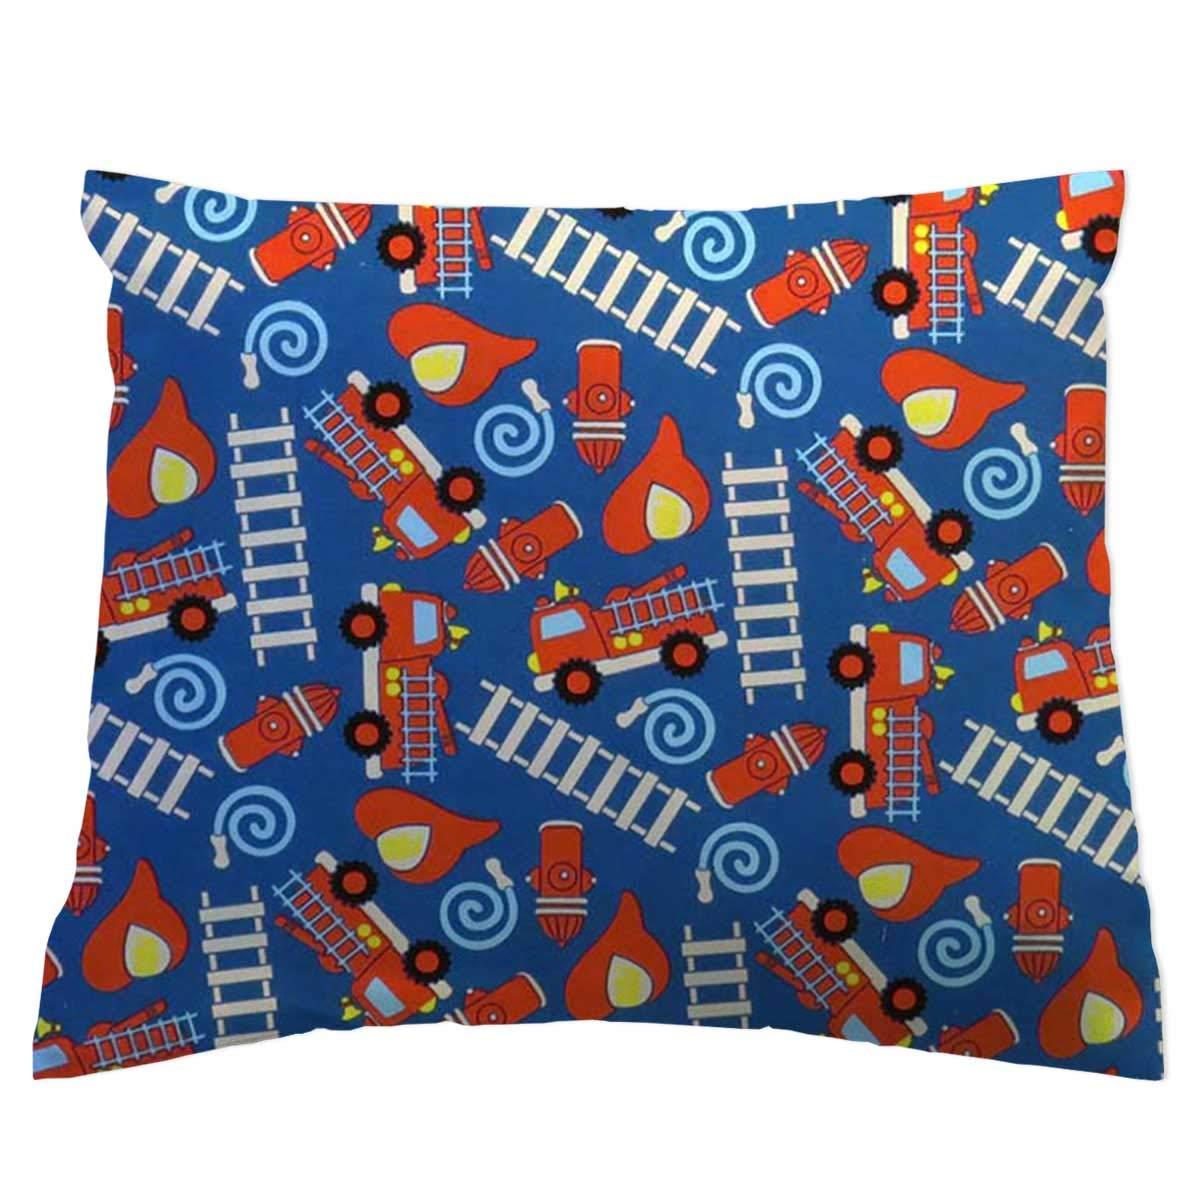 SheetWorld Crib Toddler Pillow Case, 100% Cotton Woven, Fire Trucks Blue, 13 x 17, Made in USA by SHEETWORLD.COM